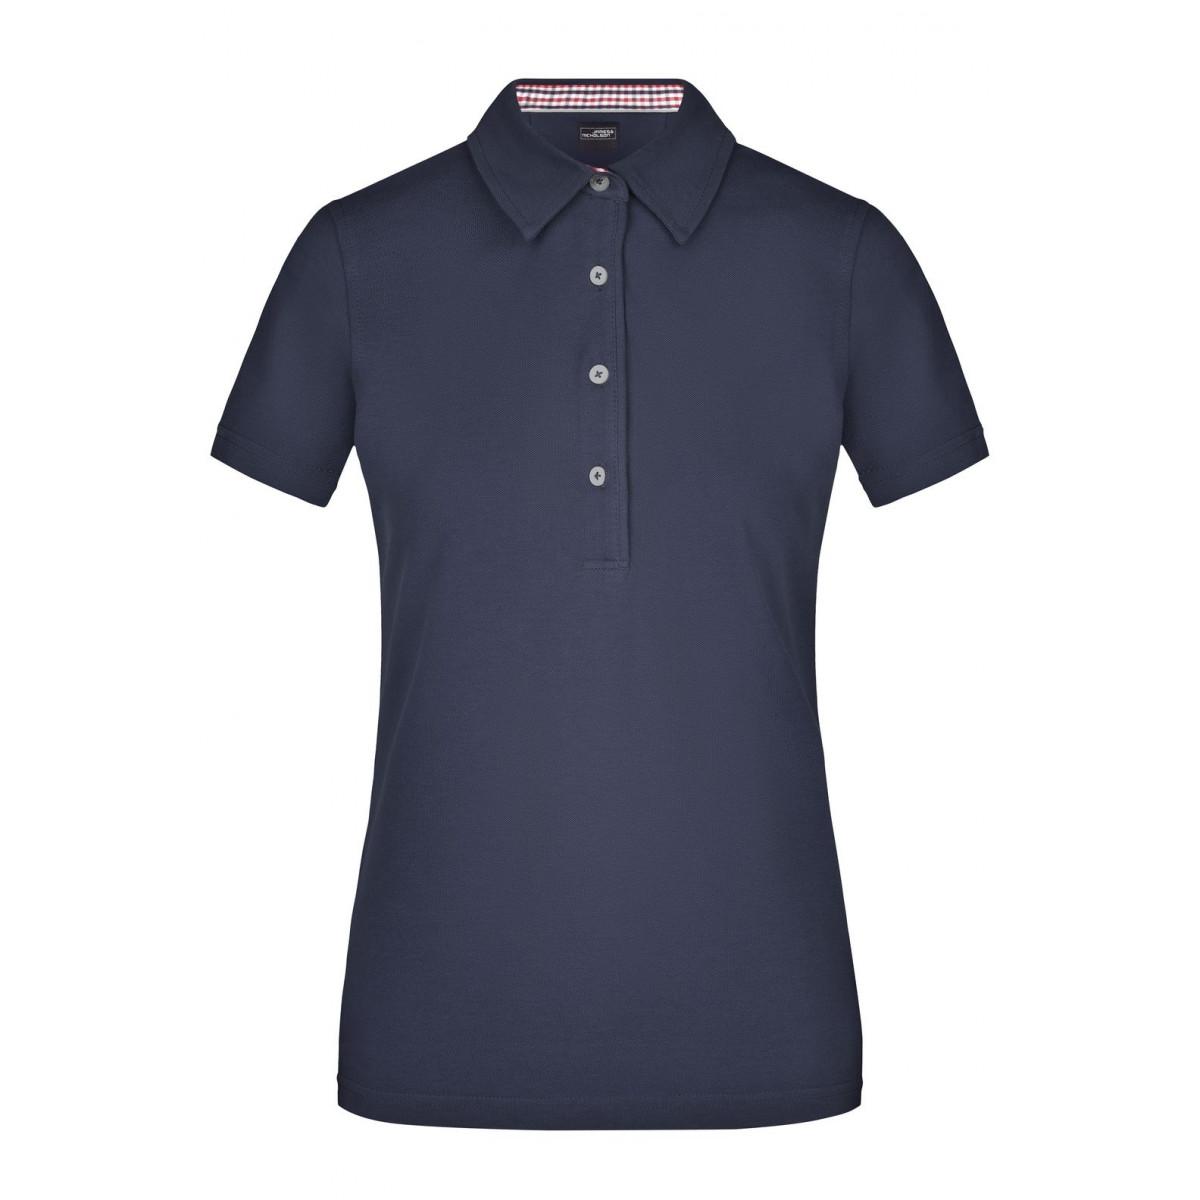 Рубашка поло женская JN969 Ladies Plain Polo - Темно-синий/Красный-Темно-синий-Белый